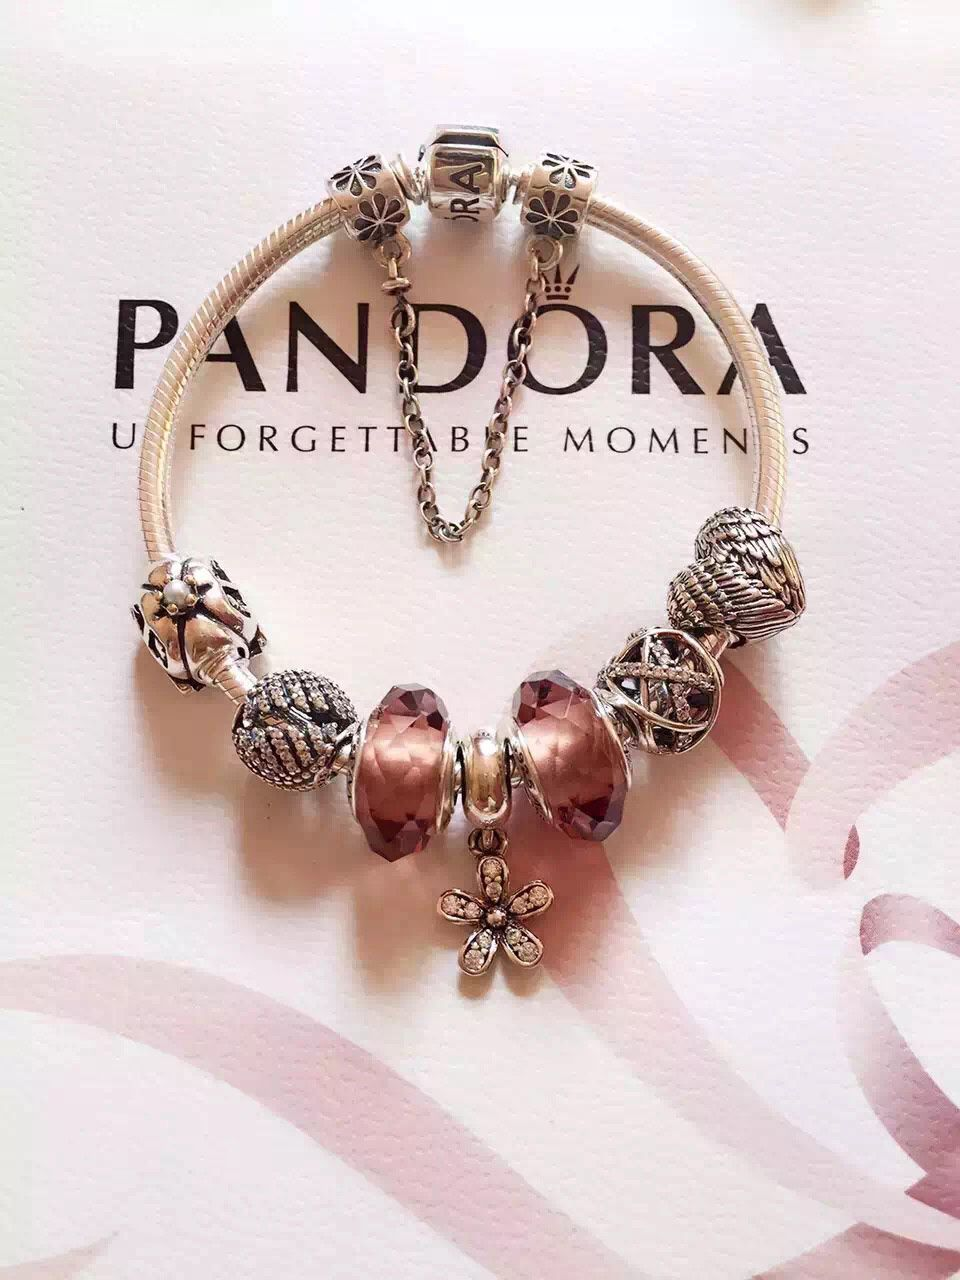 Pandora Bracelet Design Ideas pandora bracelet designs ideas 219 Pandora Charm Bracelet Pink Hot Sale